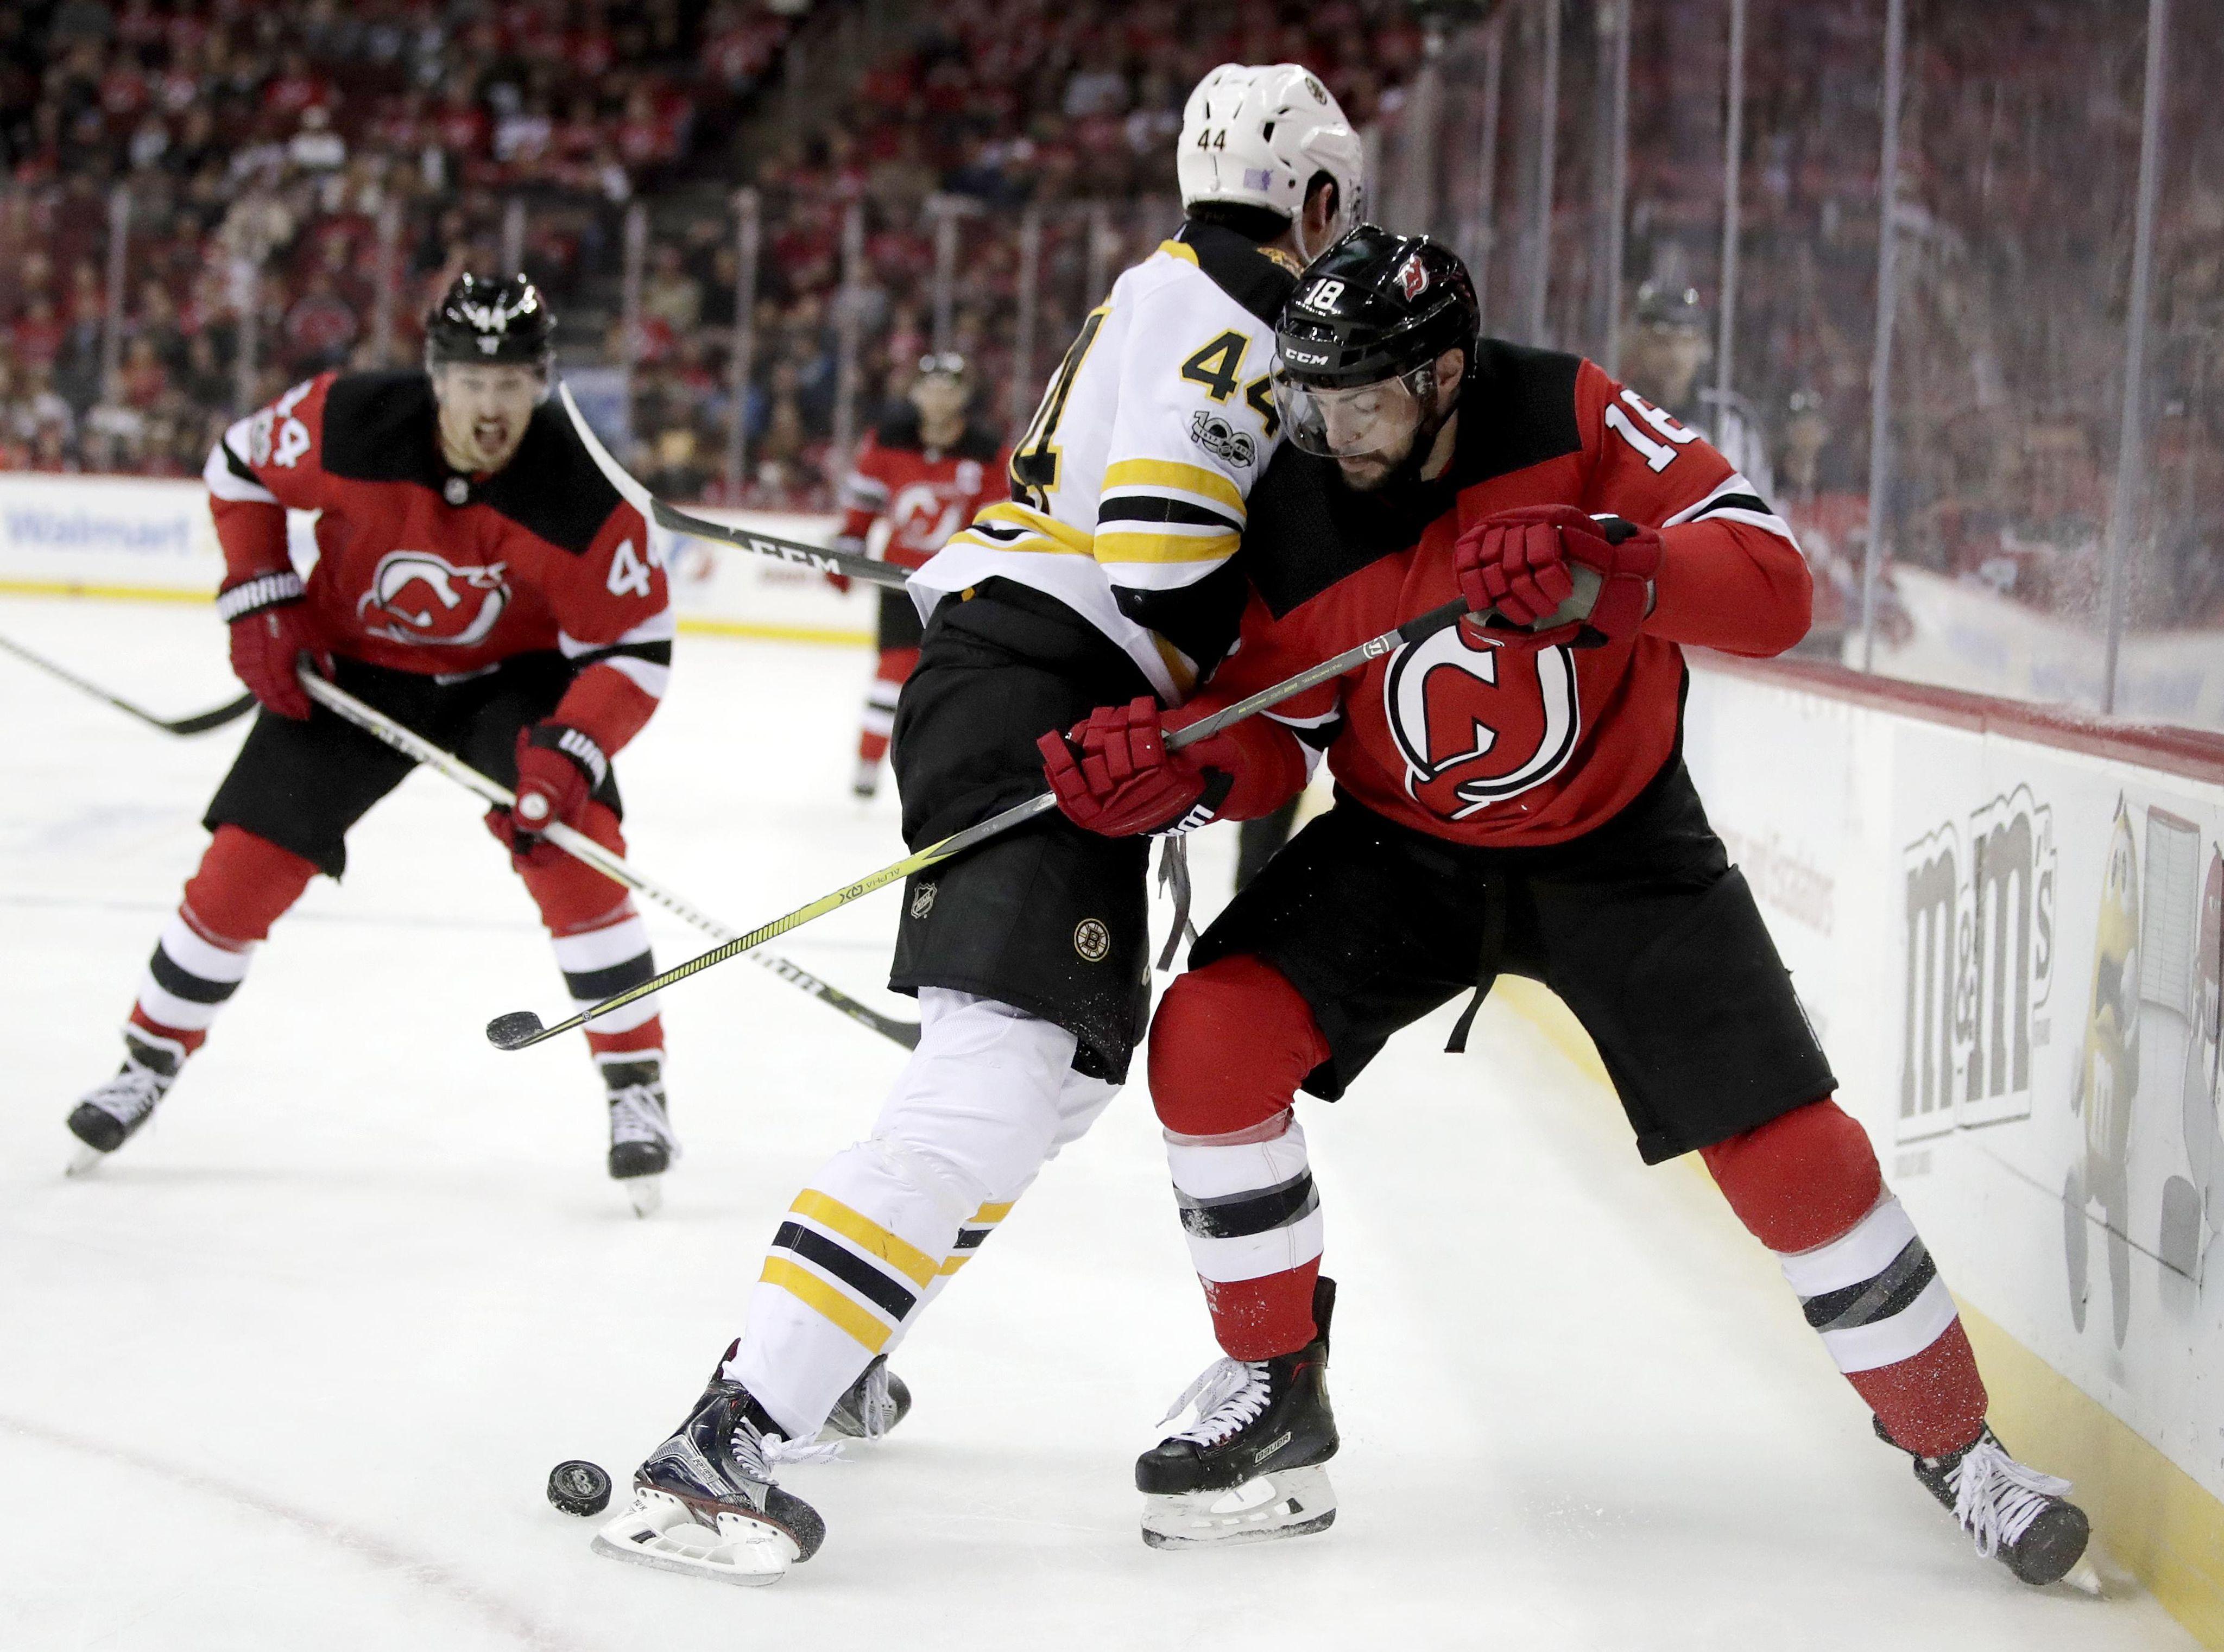 Bruins_devils_hockey_34837_s4096x3043